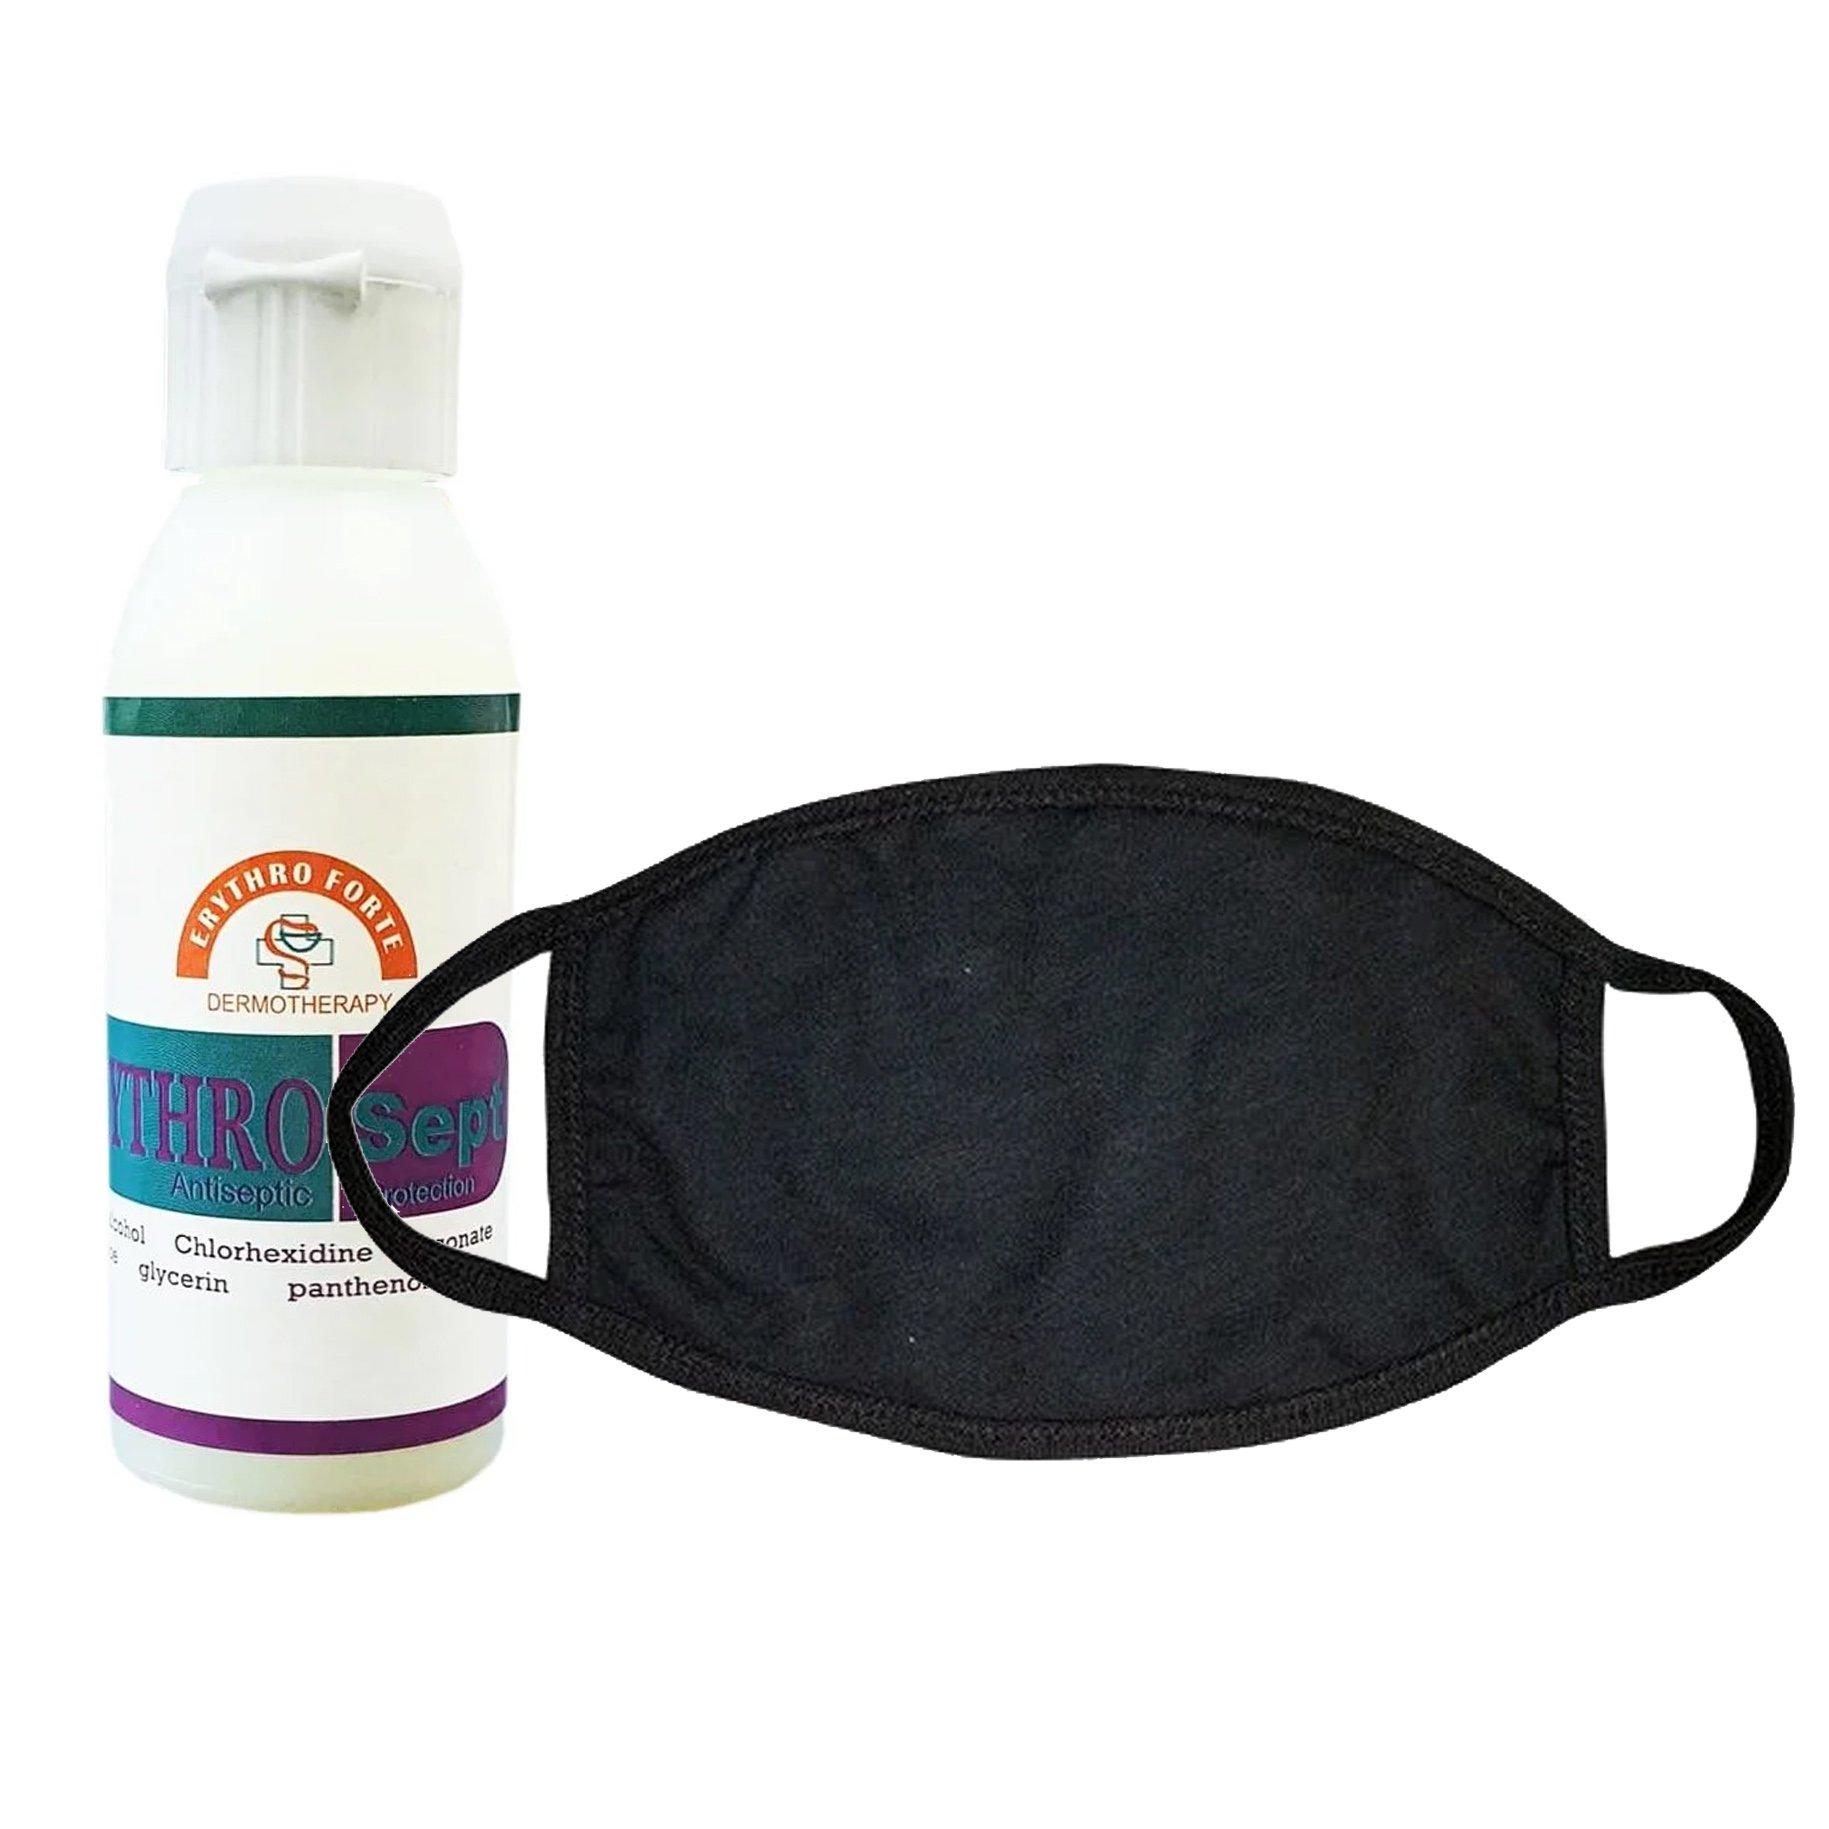 Erythro Forte Πακέτο Αντισηπτικής Προσφοράς ErythroSept Antiseptic Protection 60ml & Garden Face Mask Μάσκα Προσώπου Υφασμάτινη